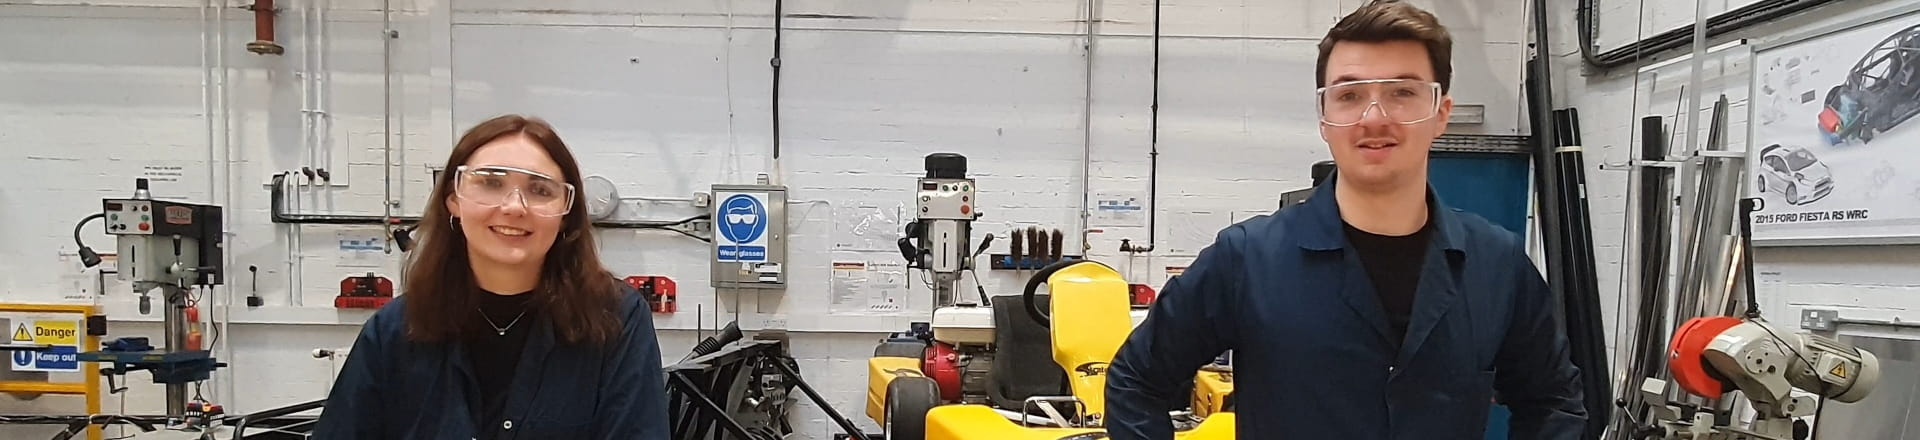 Team in a workshop